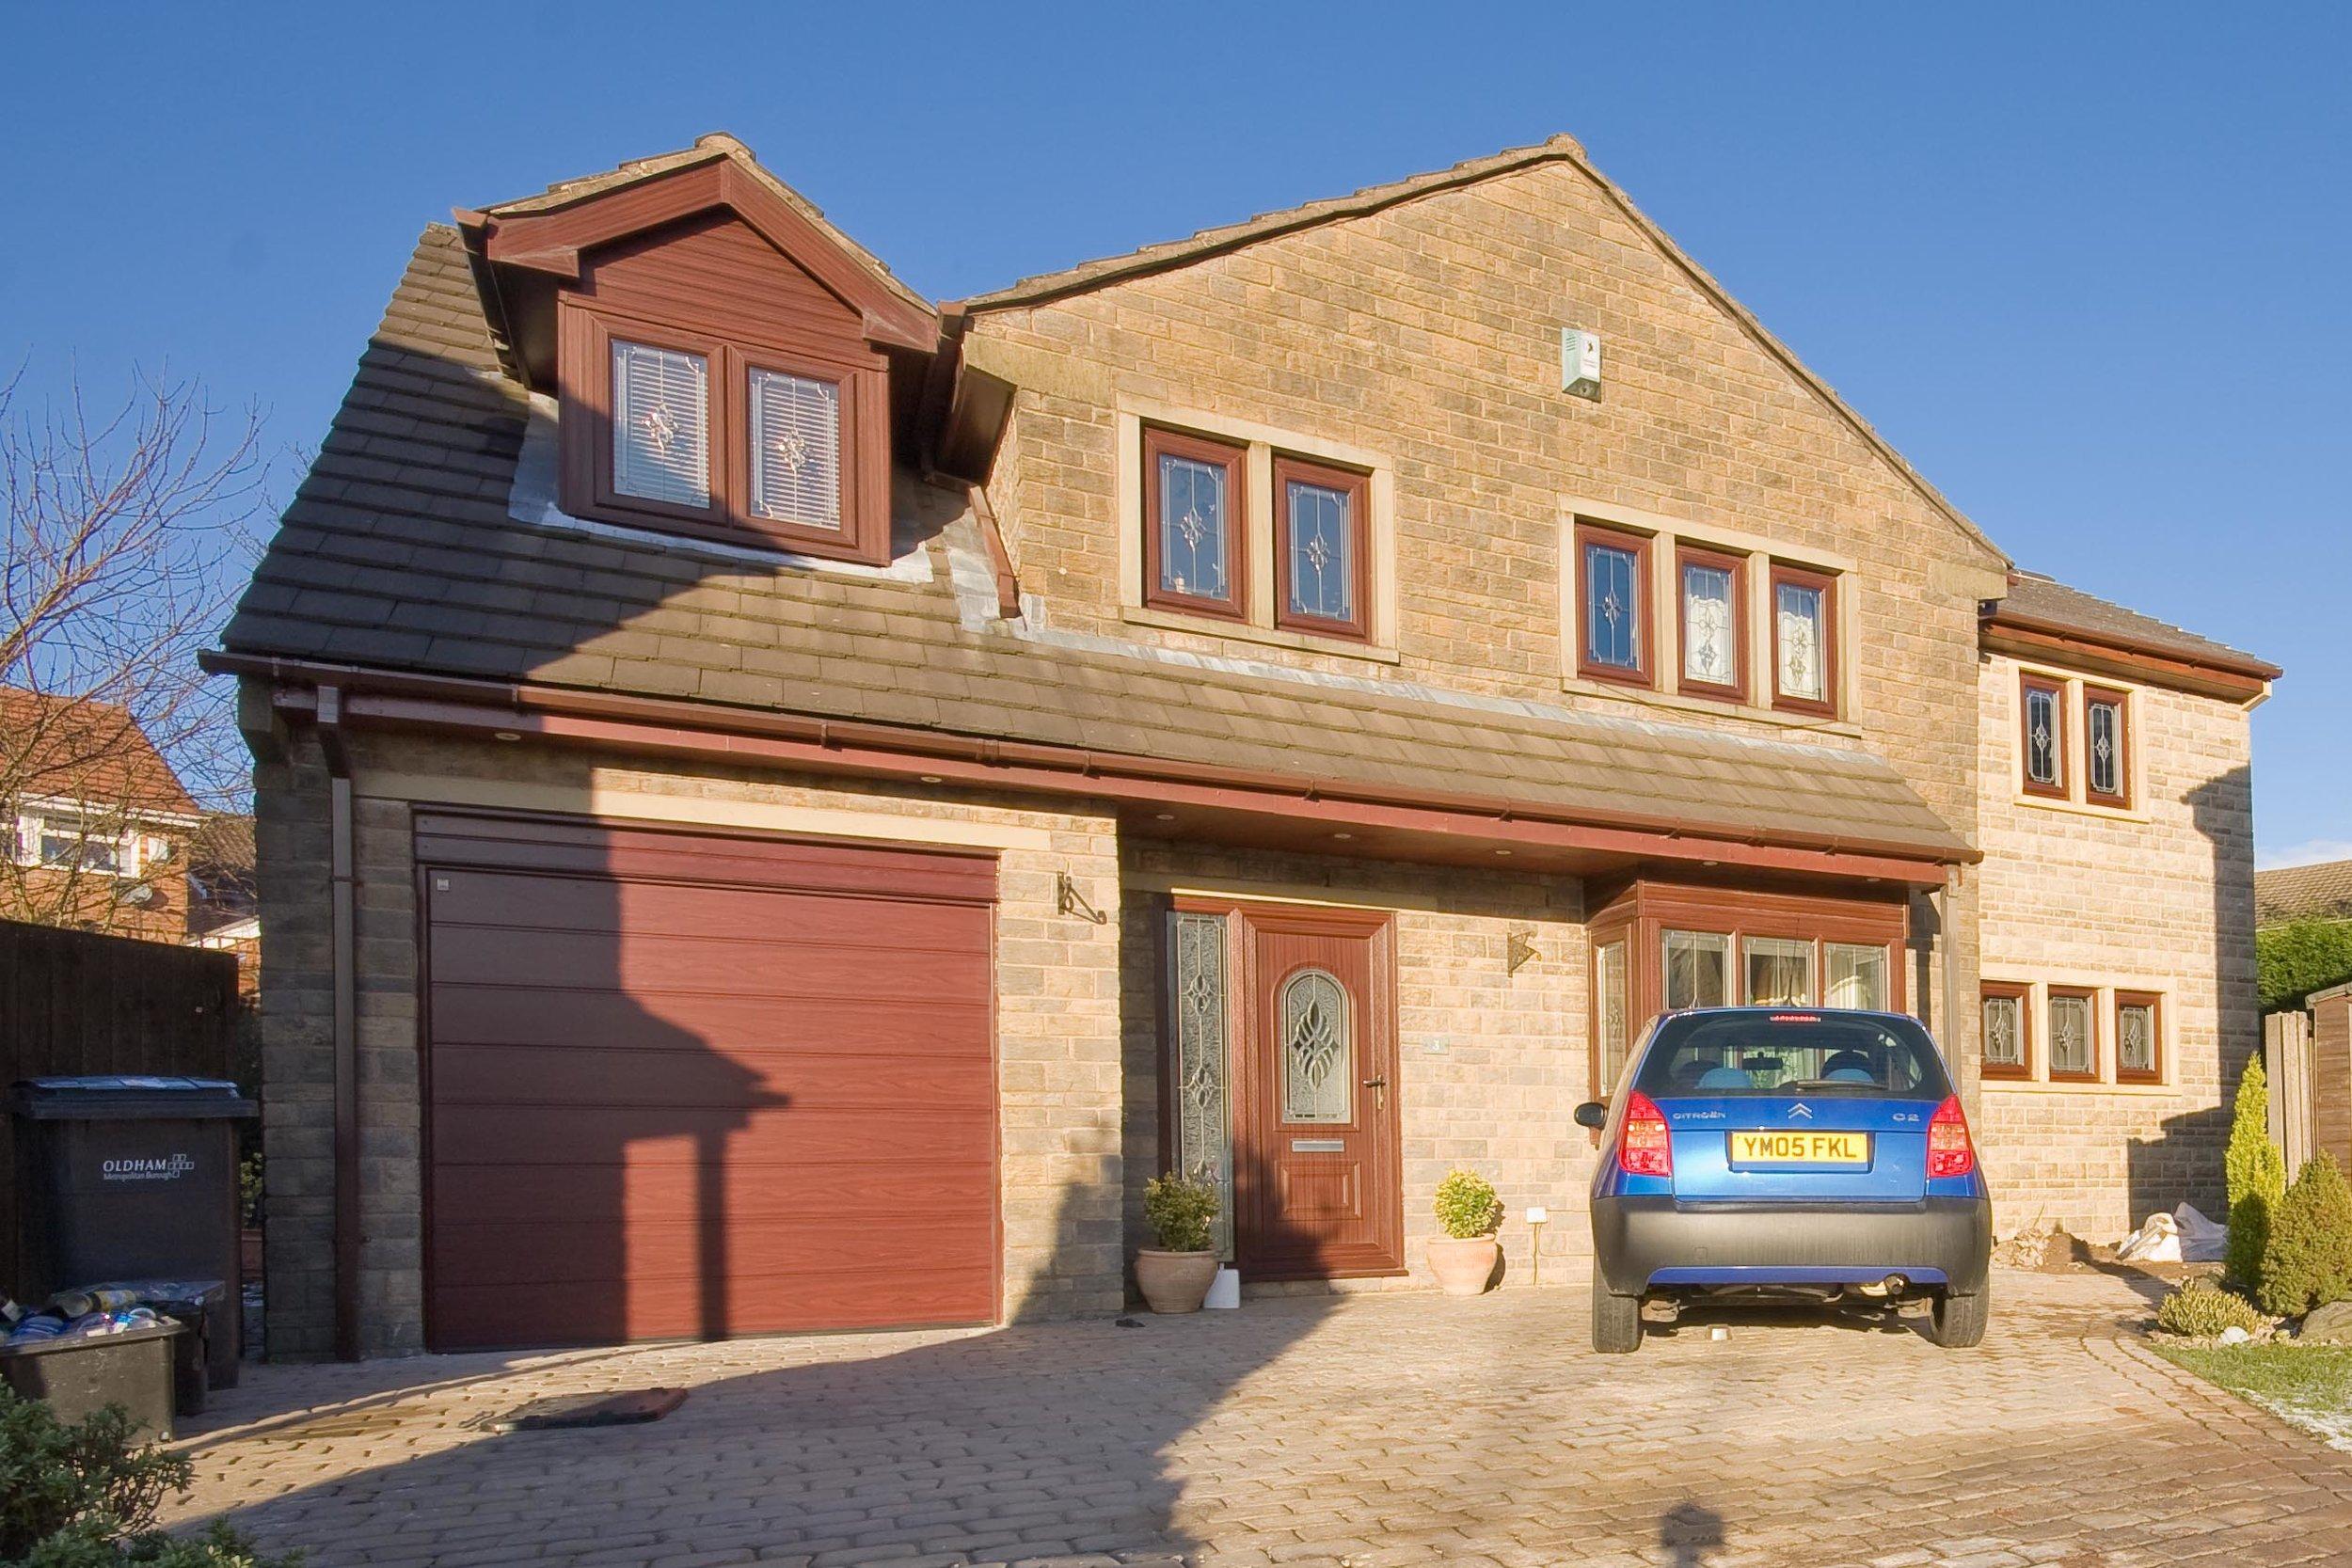 PropertyPhotographs-4536.jpg